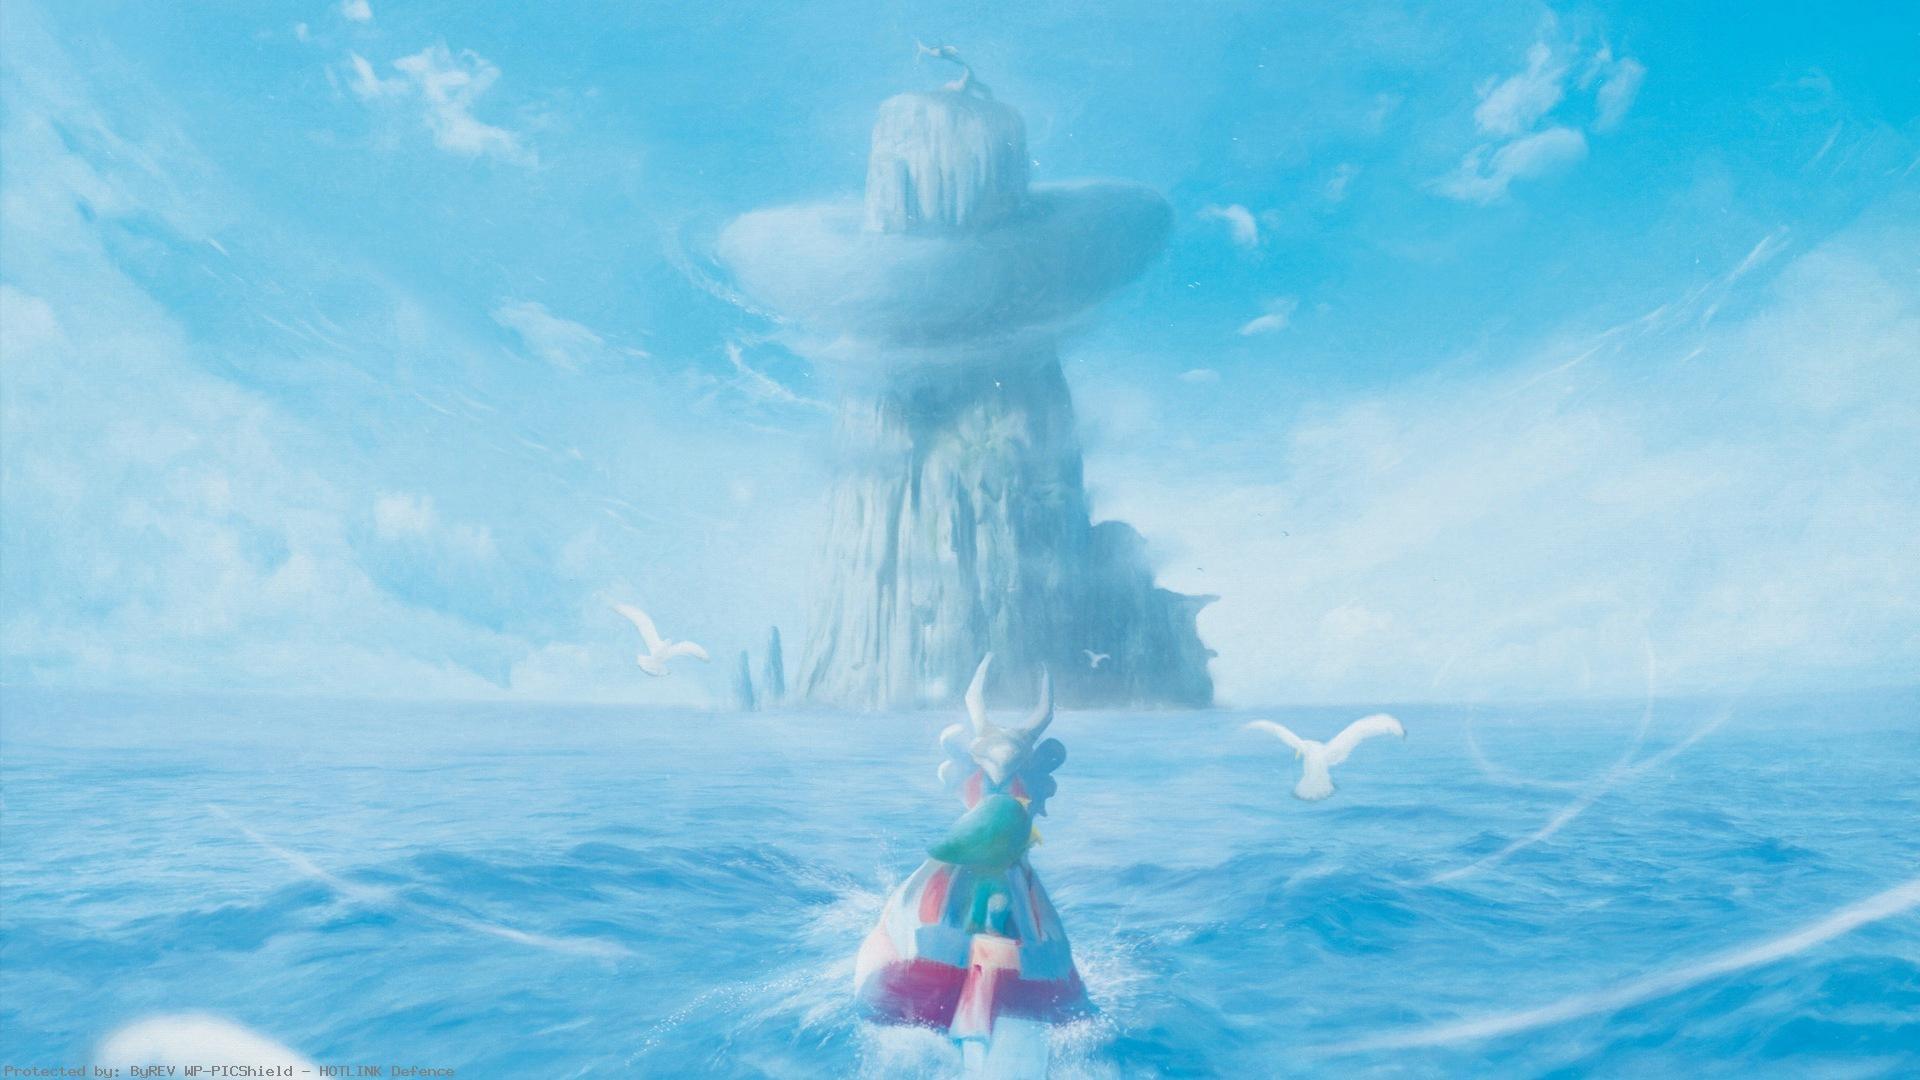 The-Legend-of-Zelda-Wind-Waker-Link-King-